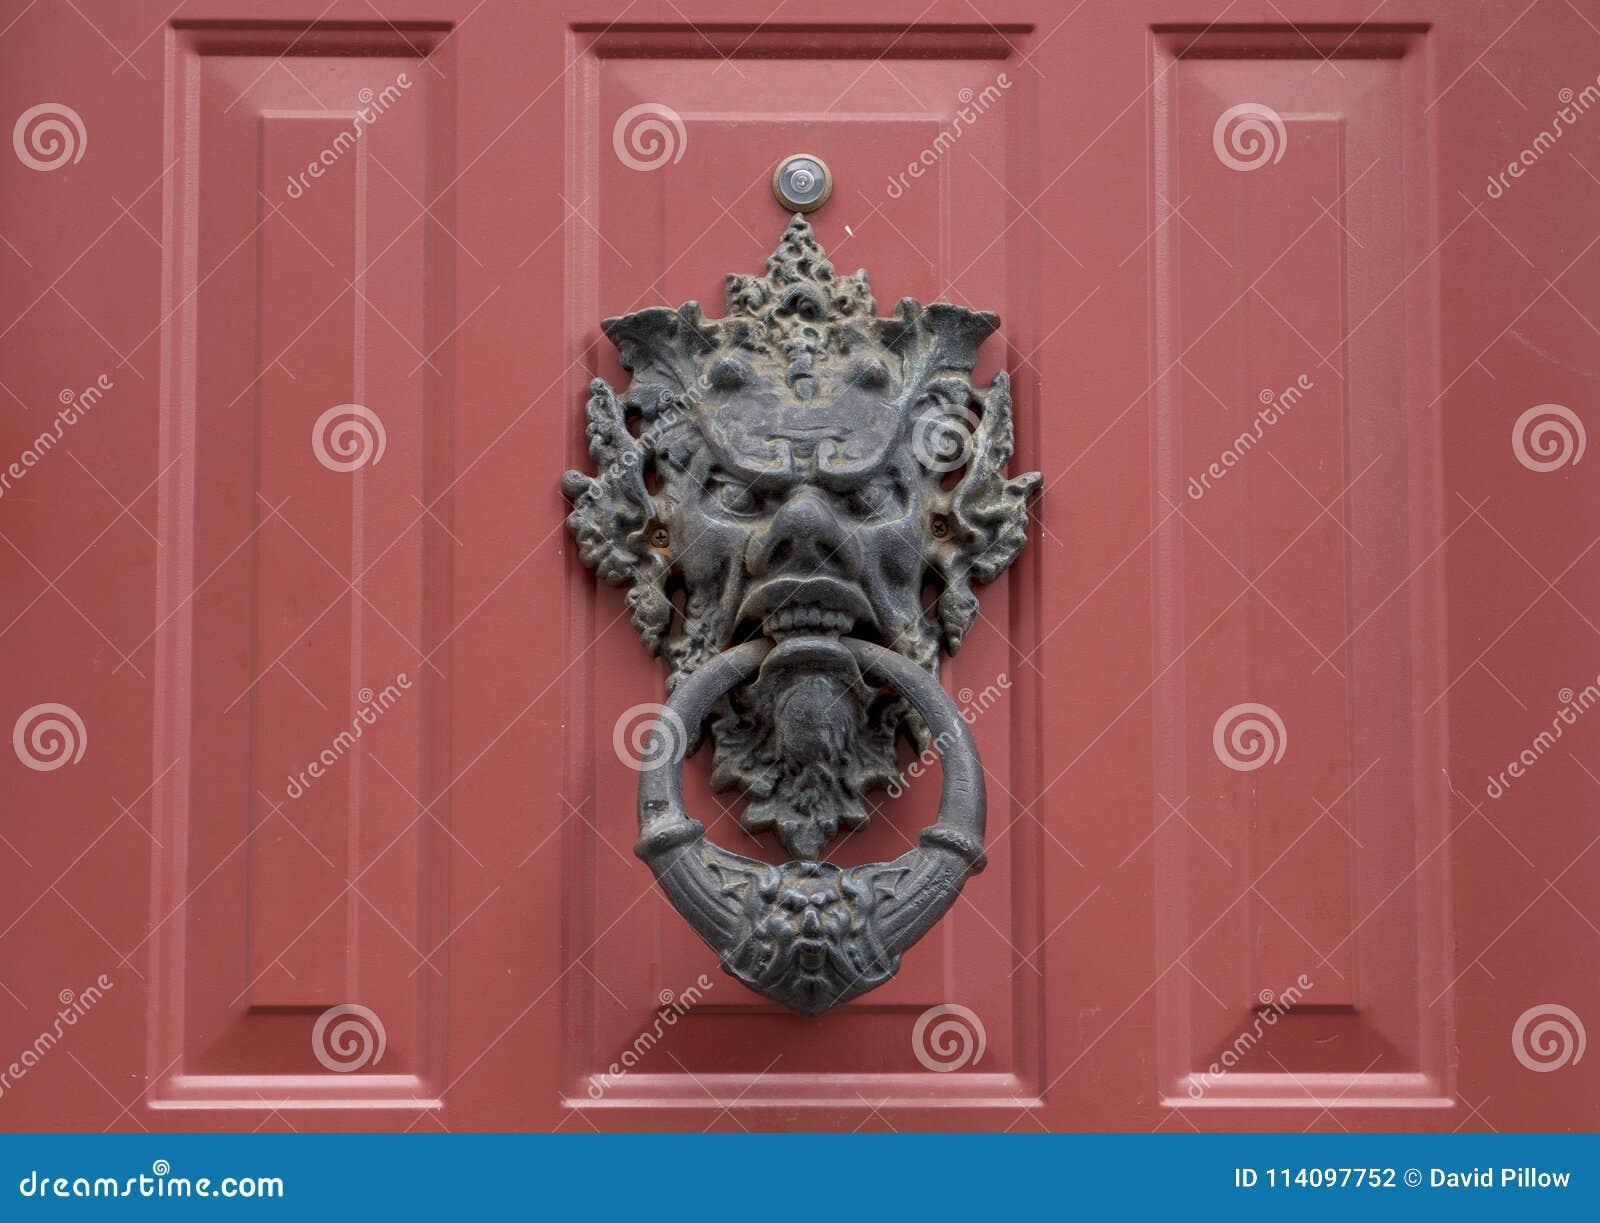 Interesting metal doorknocker, South Philadelphia